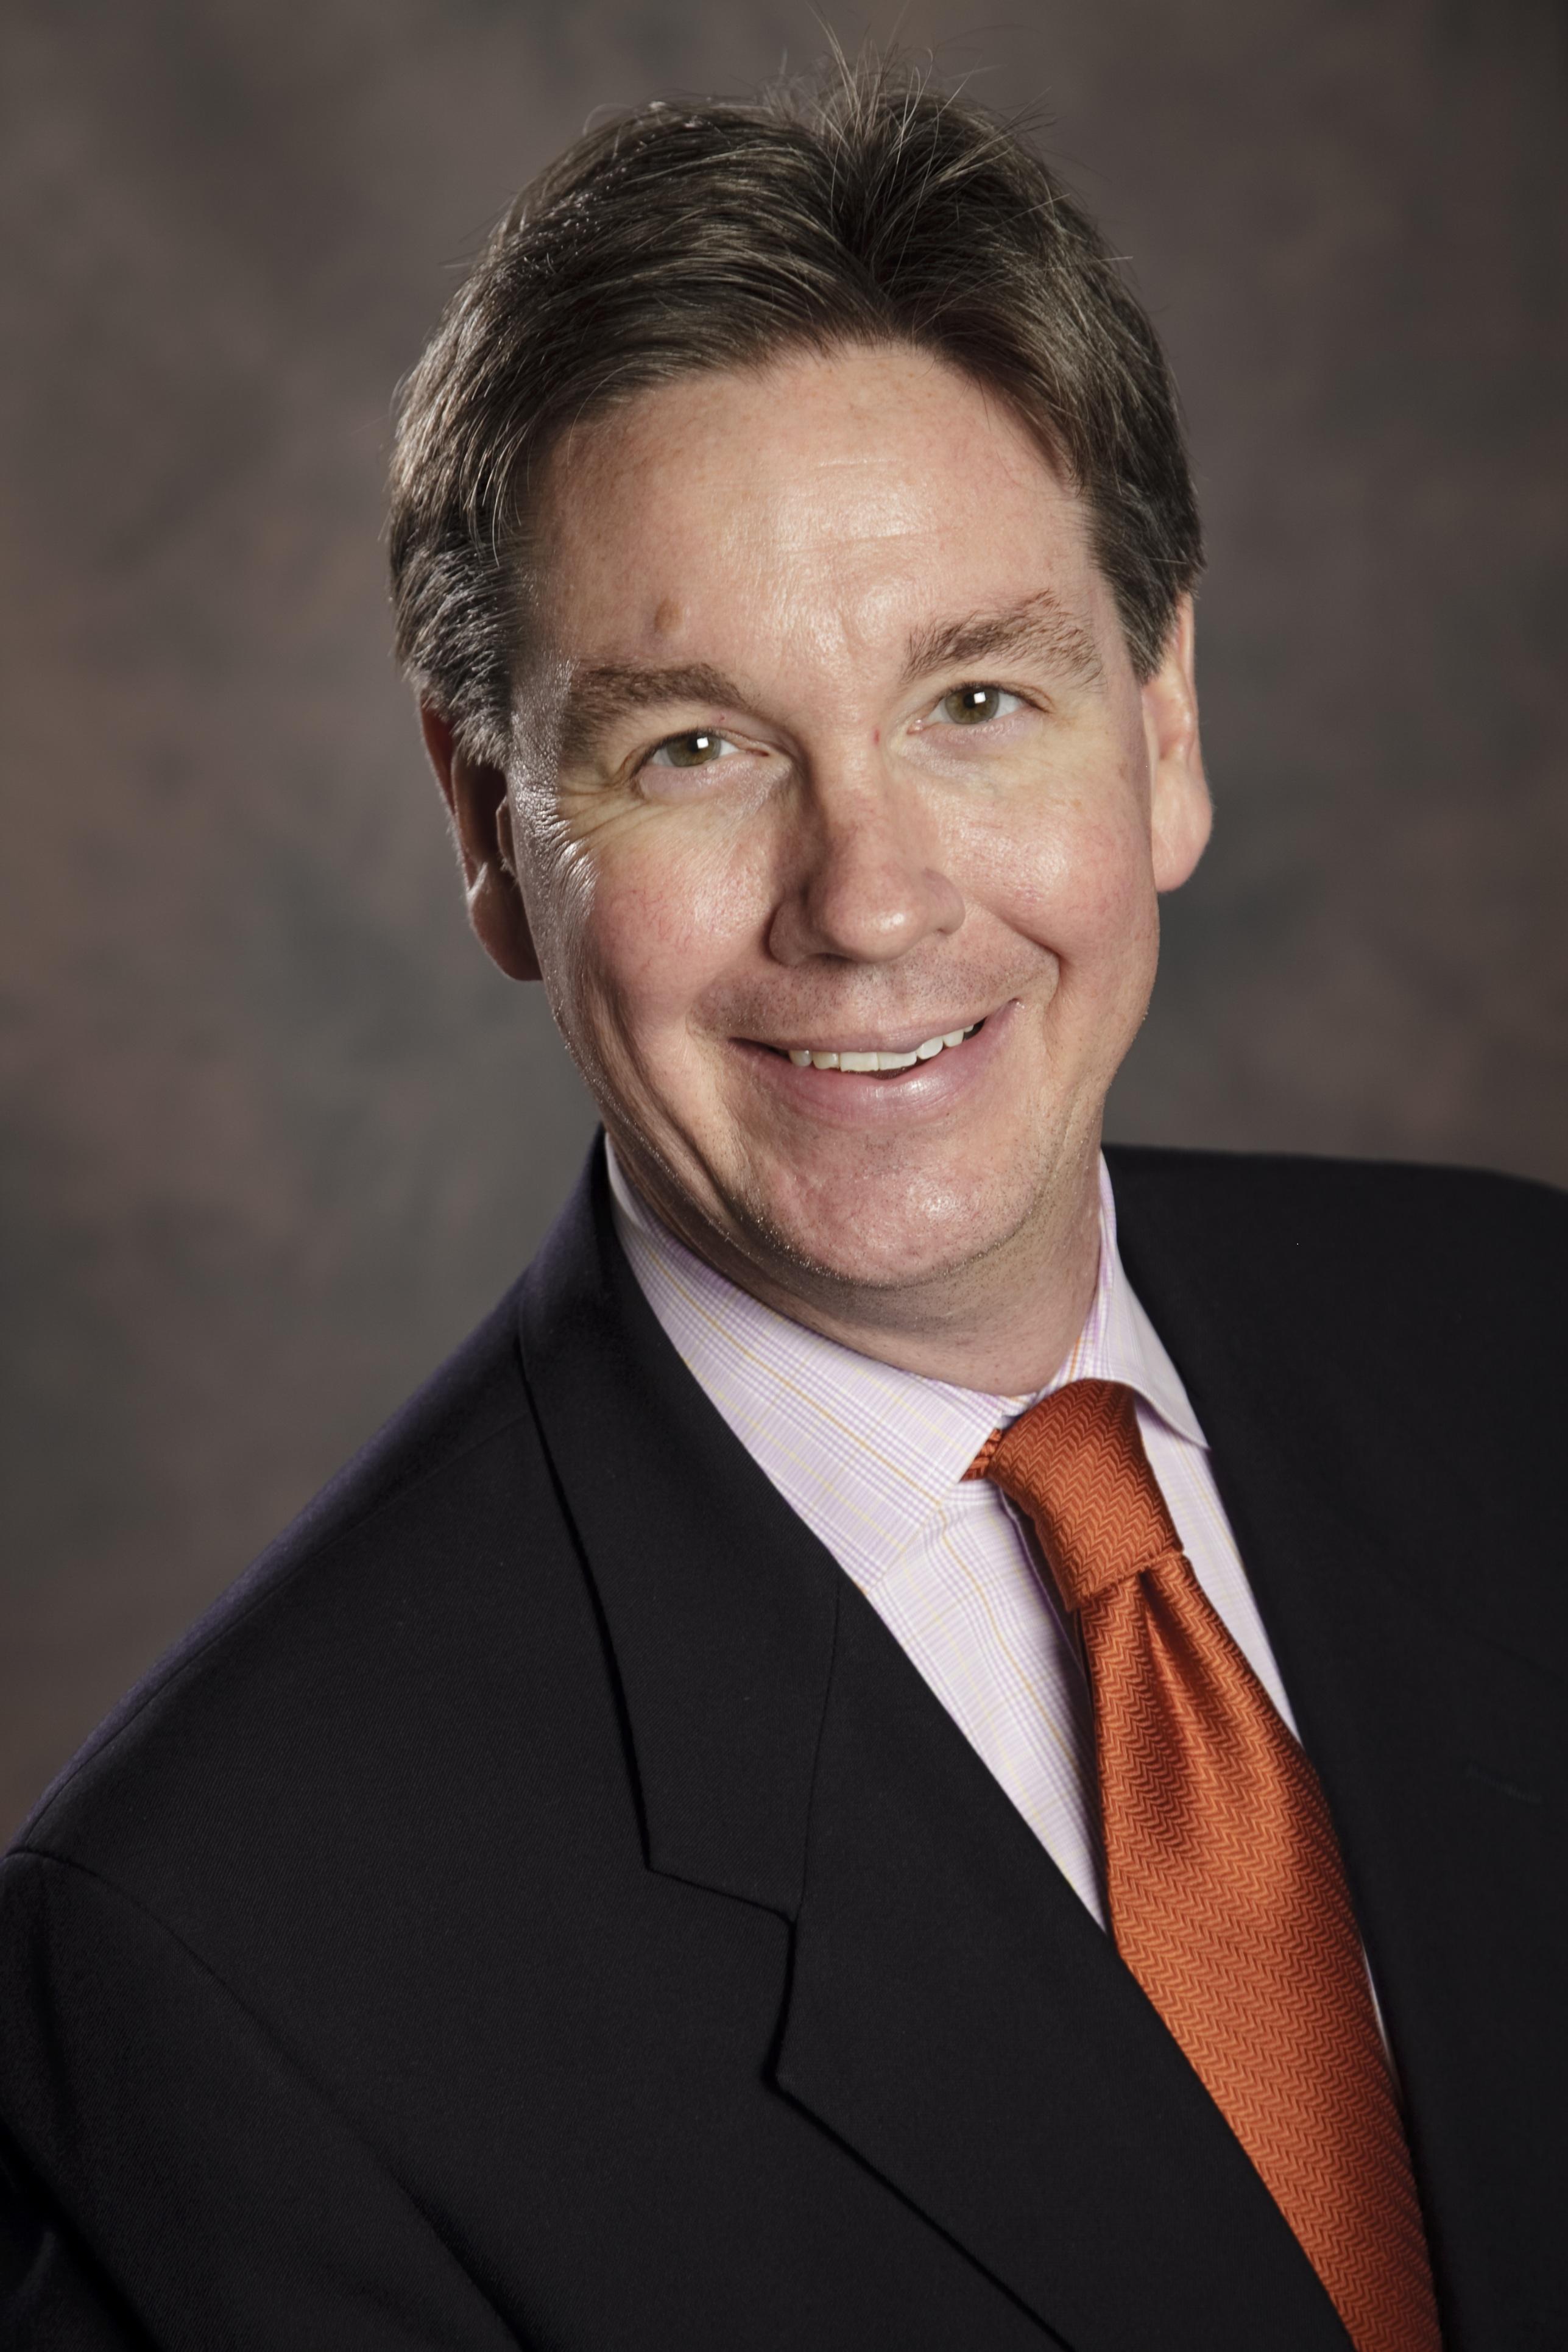 Brian Wieters